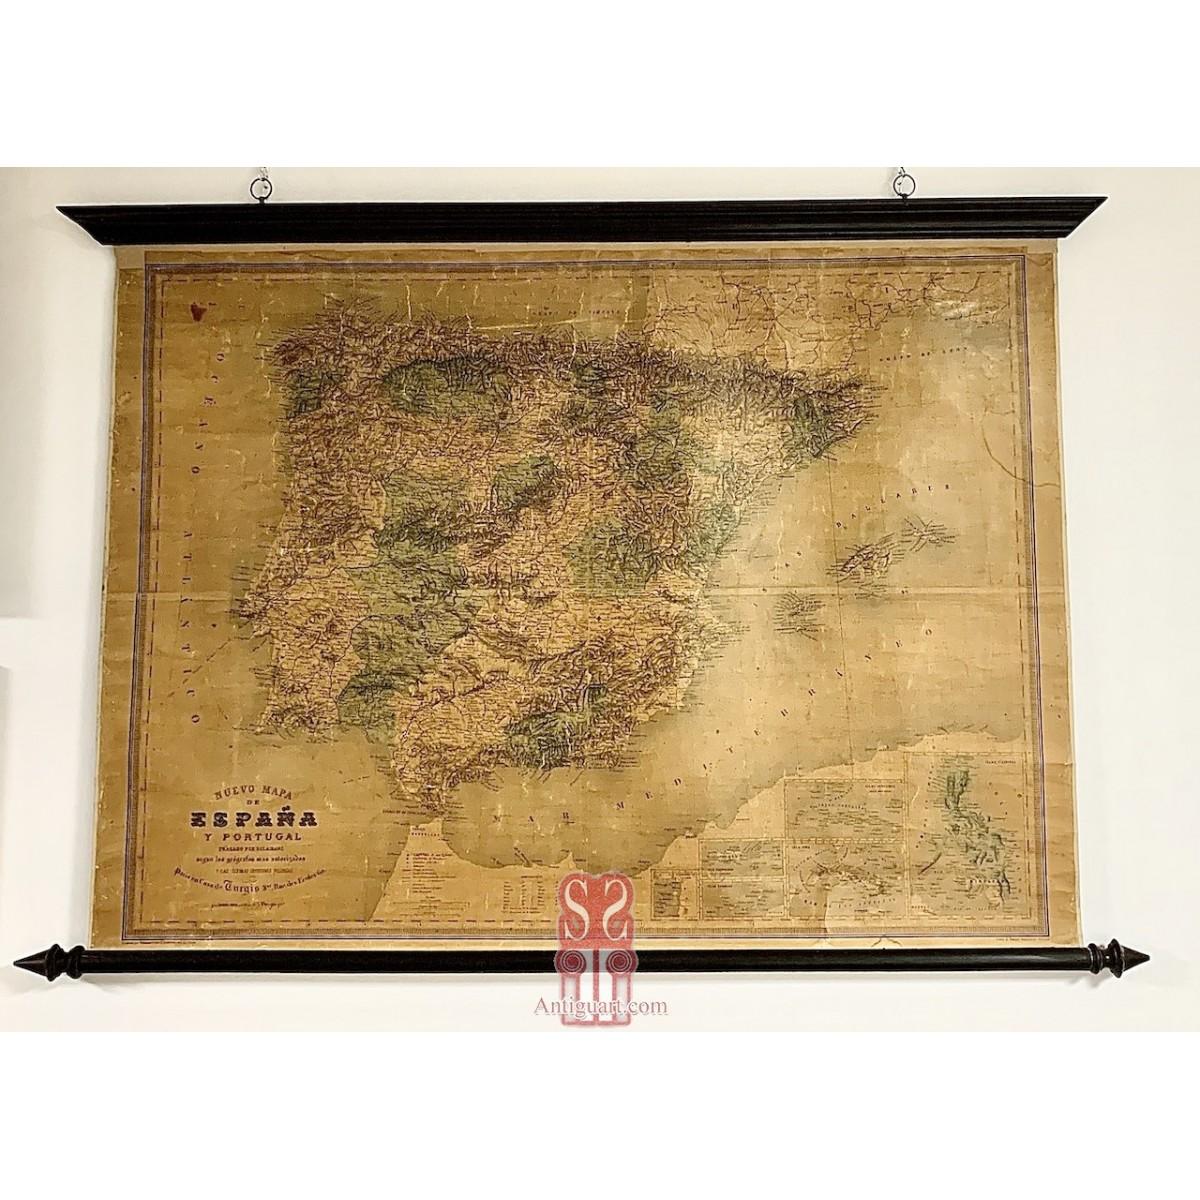 Mapa de España del siglo XIX (1870-1880)